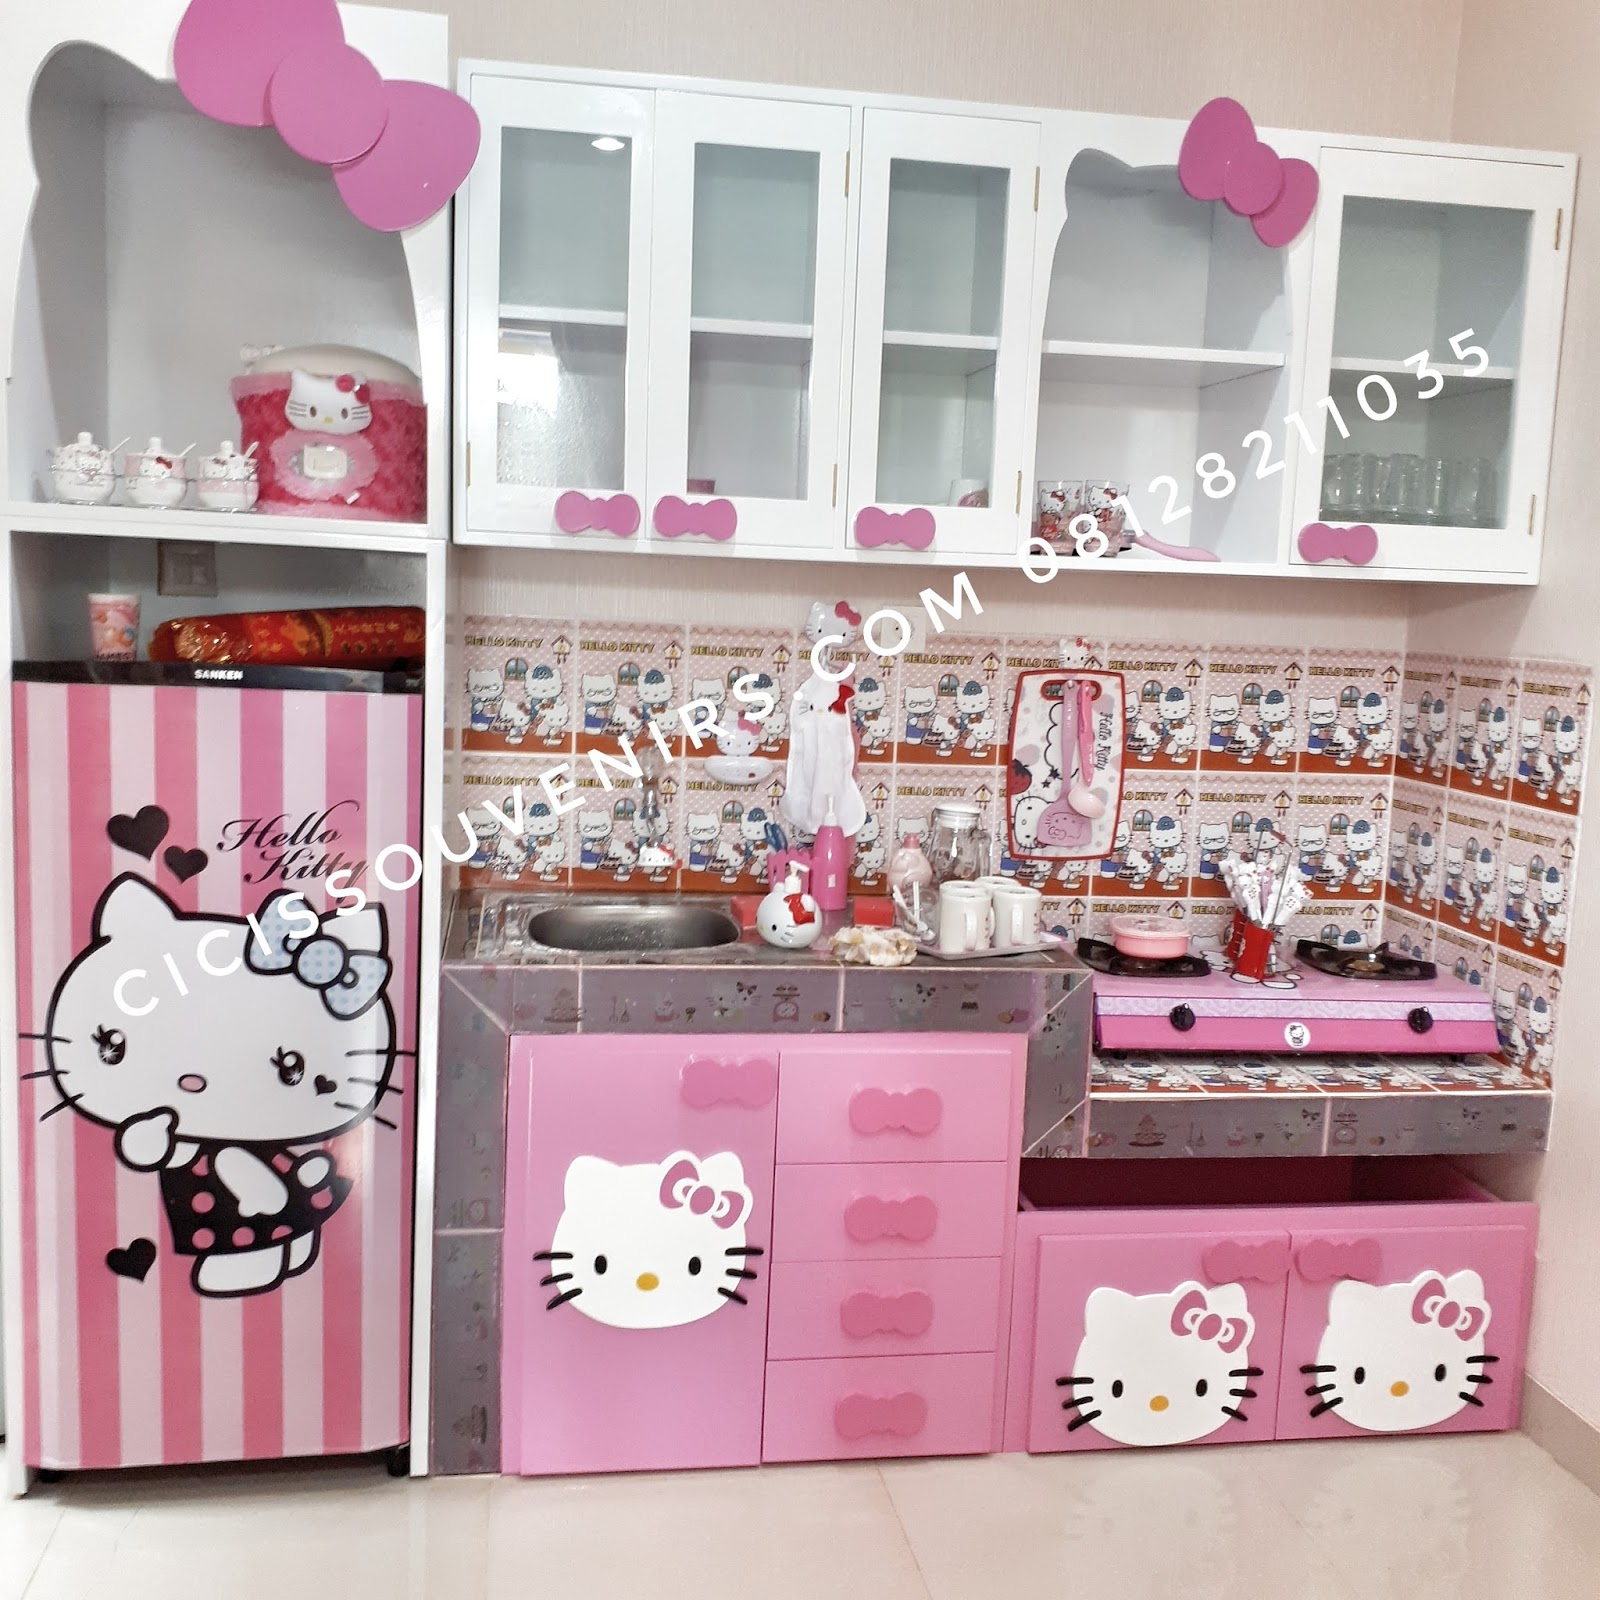 Kitchen Set Hello Kitty: Www.cicissouvenirs.com: Kitchen Set, Meja Makan, Kursi